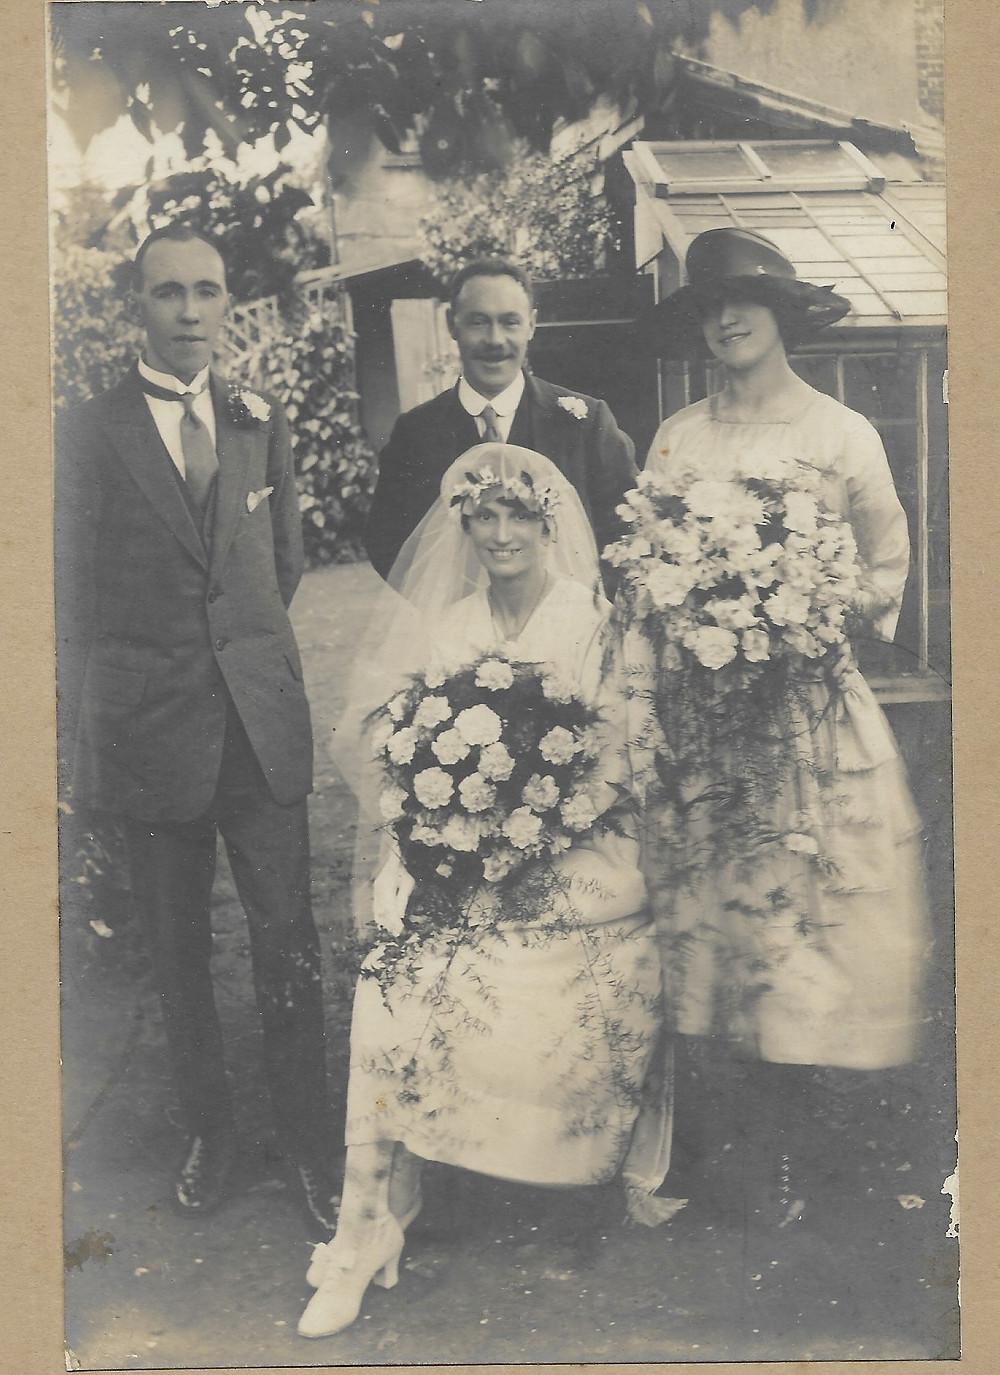 Sam Clark's wedding to Dolly.